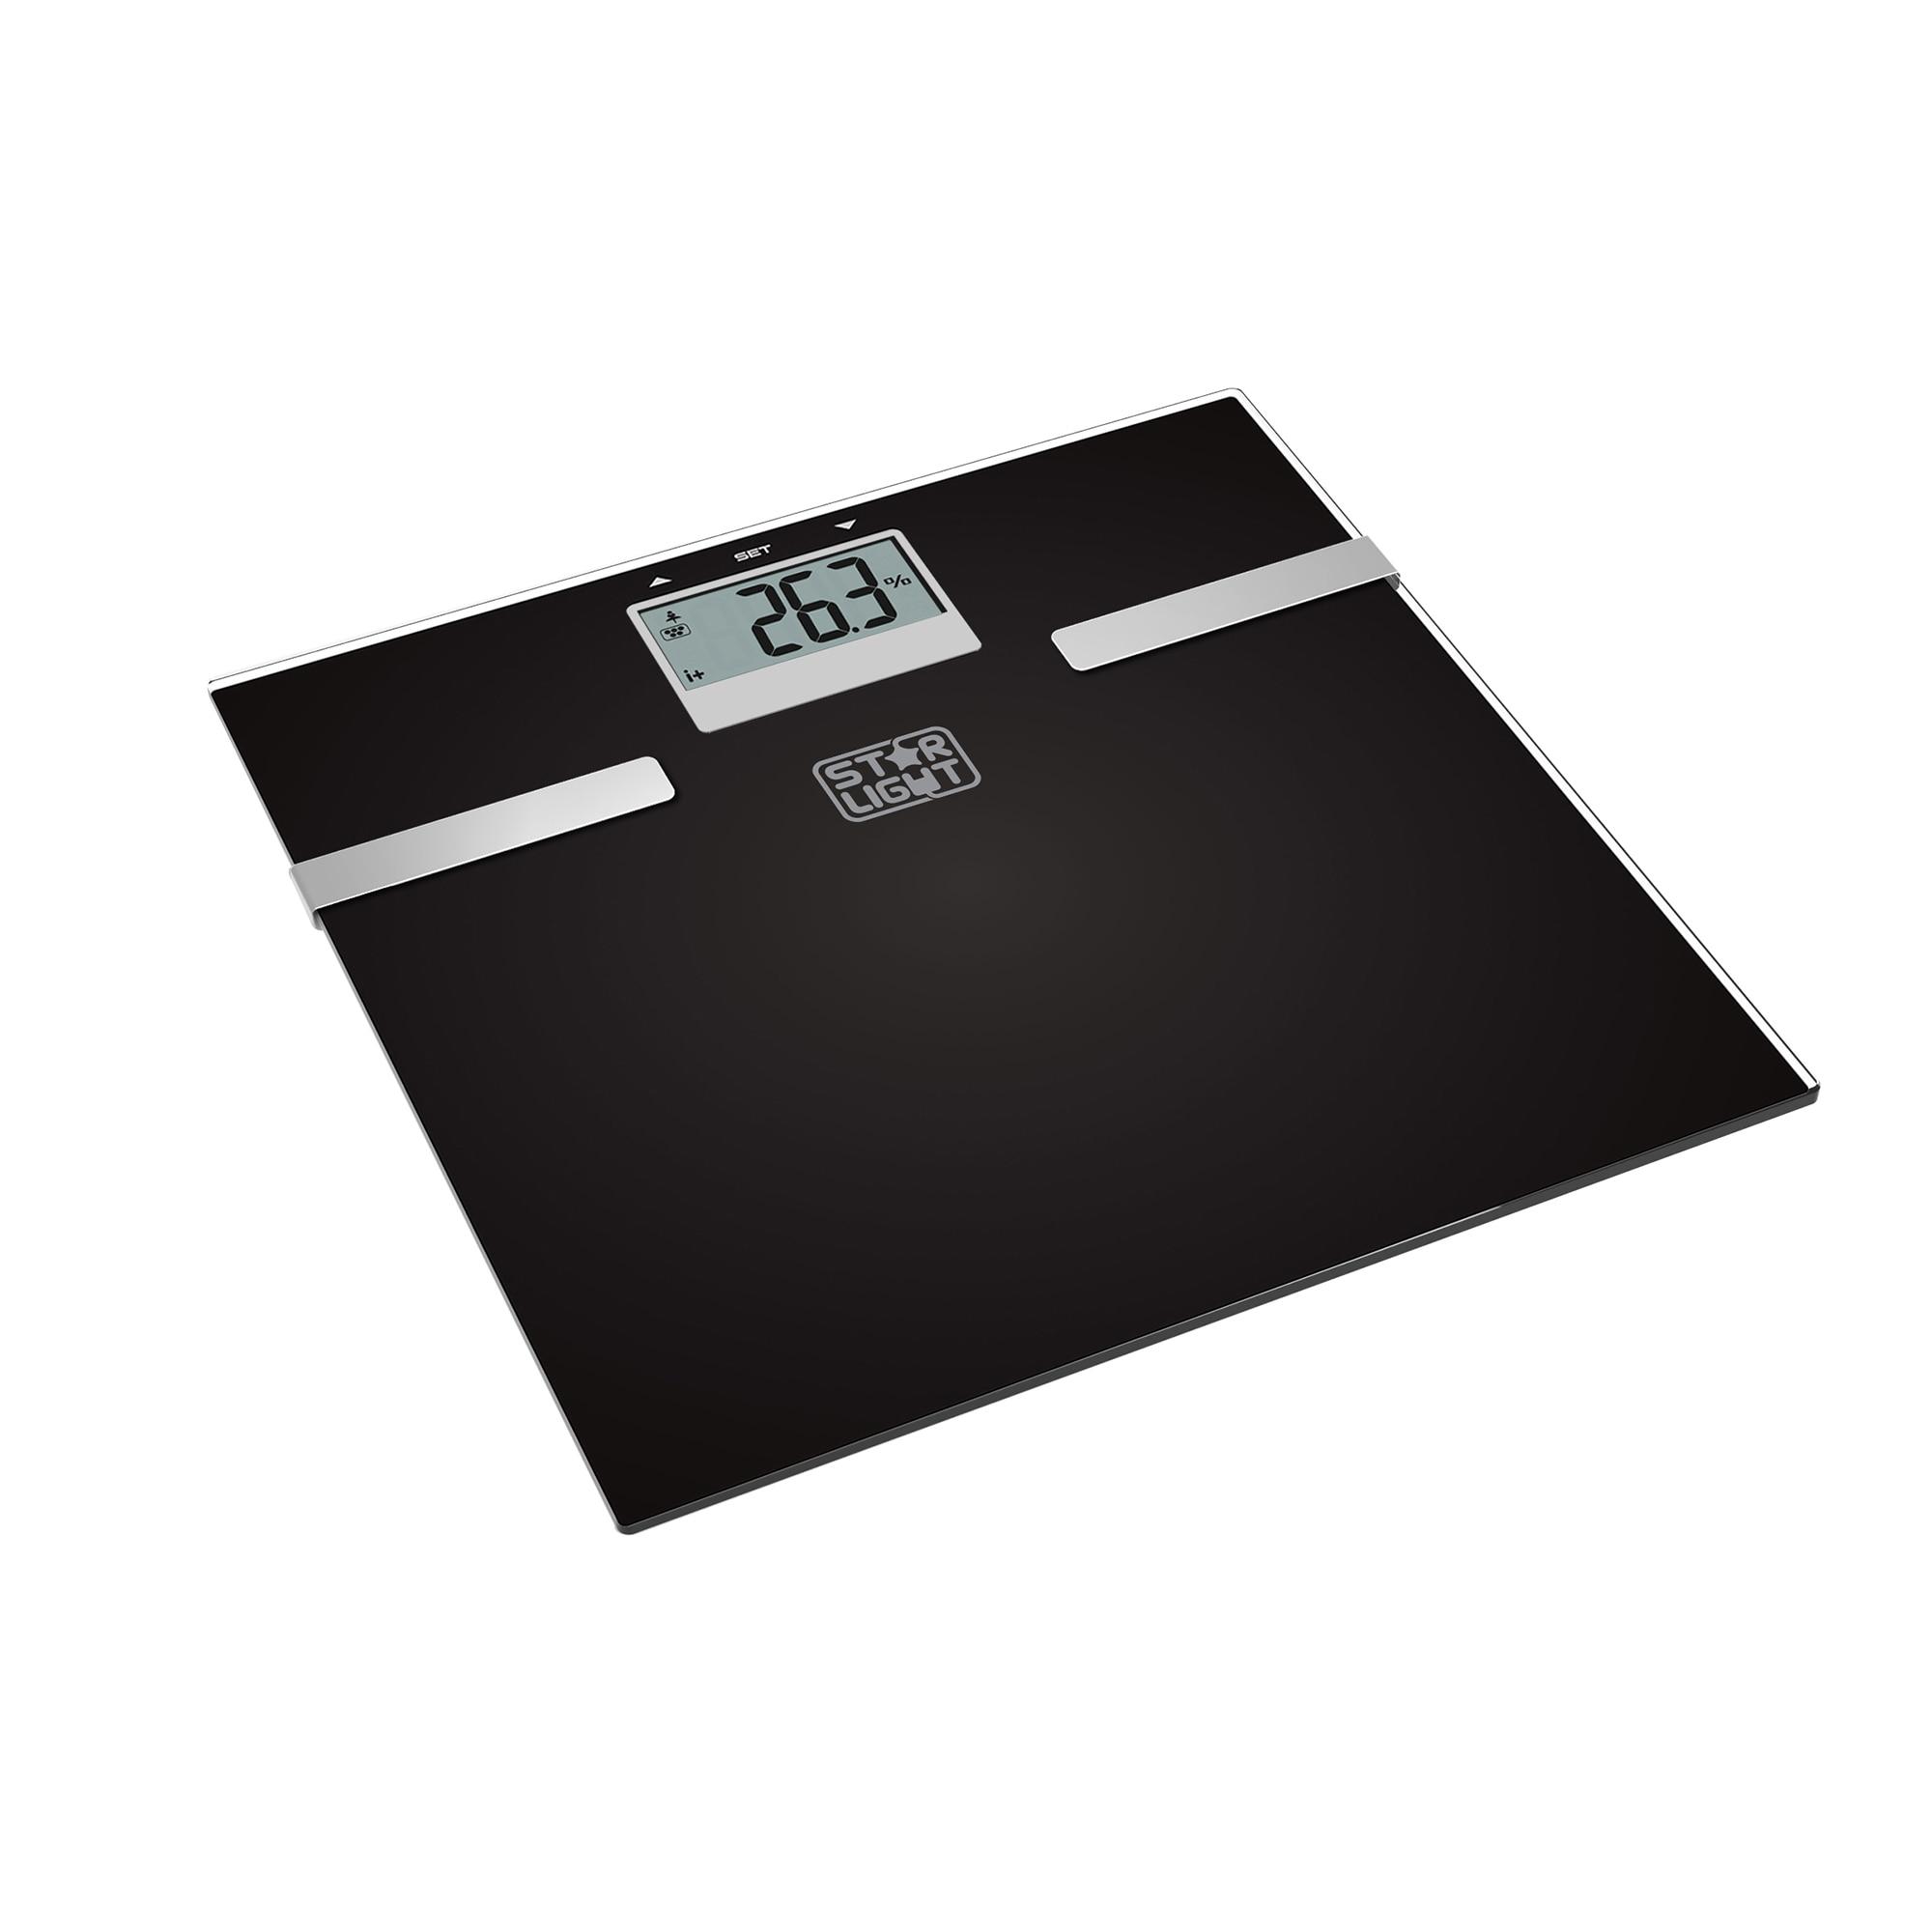 Fotografie Cantar corporal de diagnostic Star-Light BFC-150B, 150 kg, functie BMI, Sticla, Negru/Inox